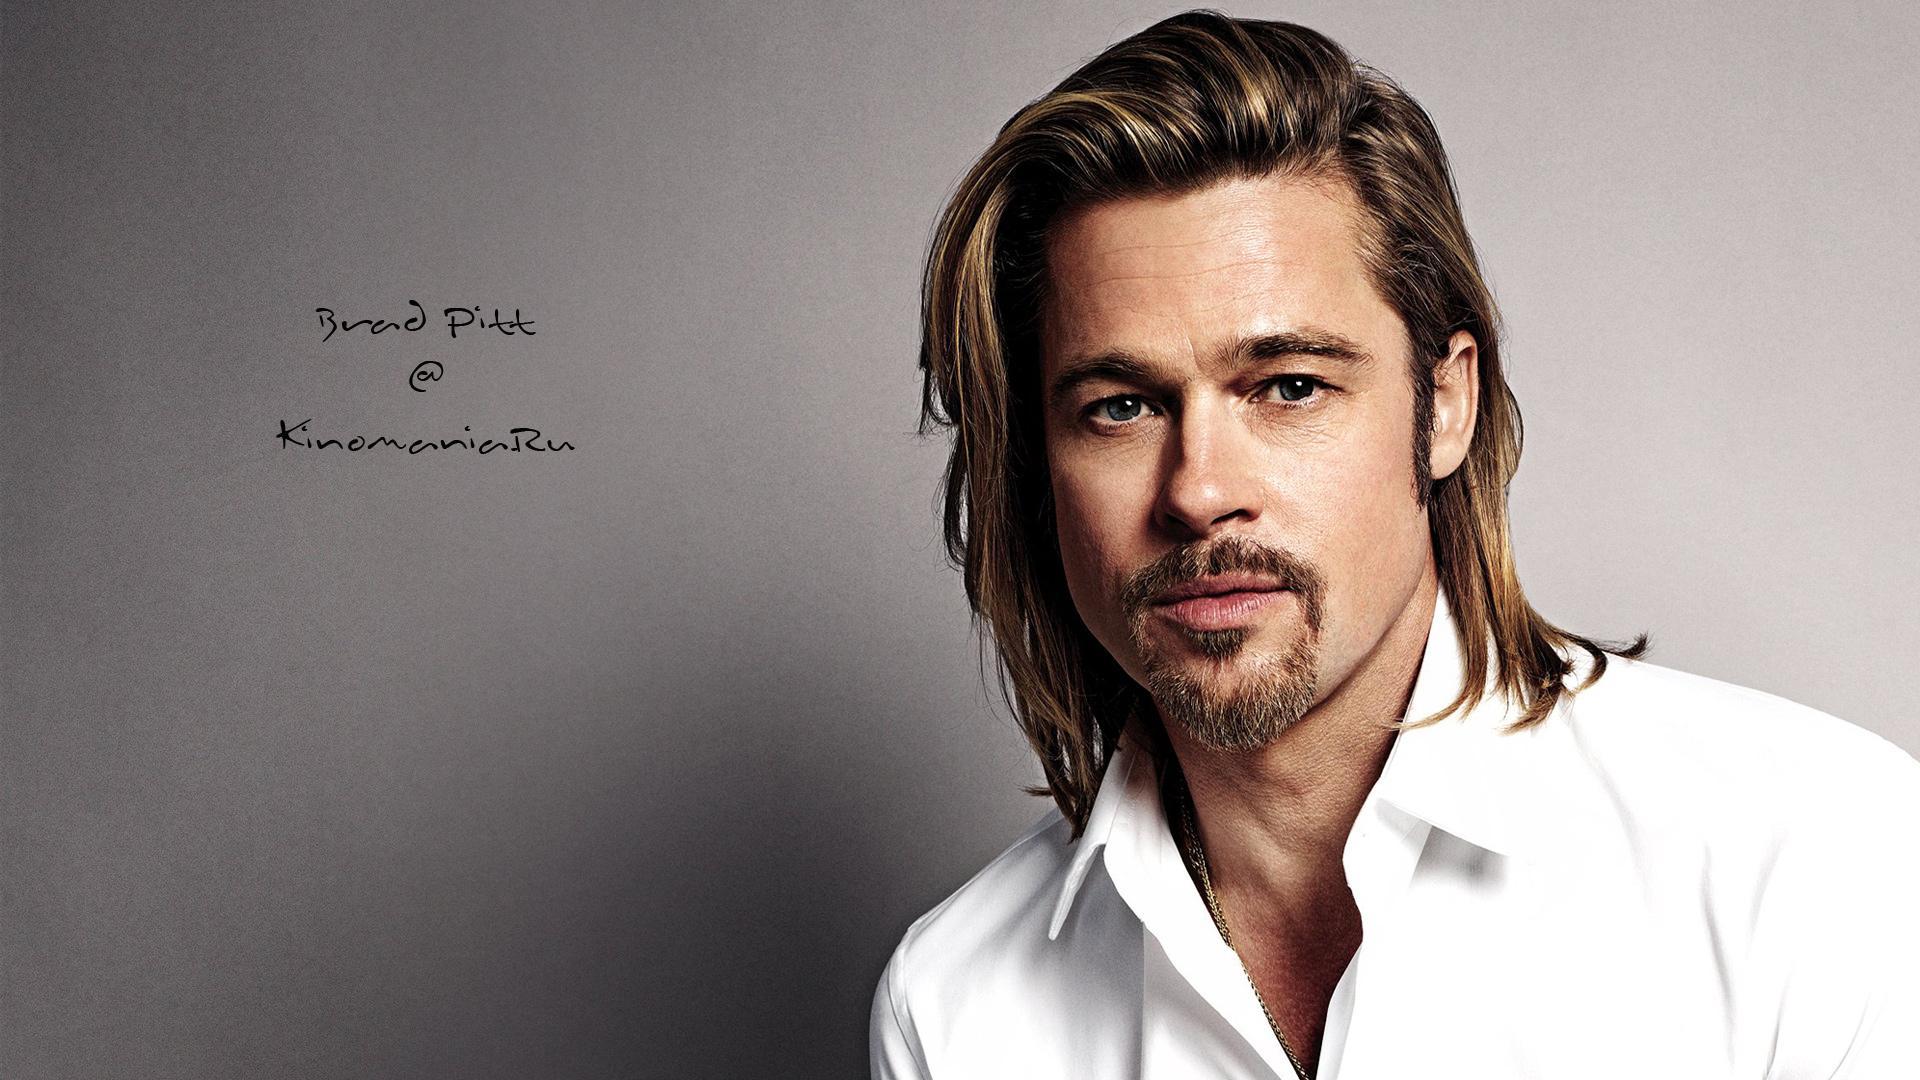 Brad Pitt 15 Free Hd Wallpaper